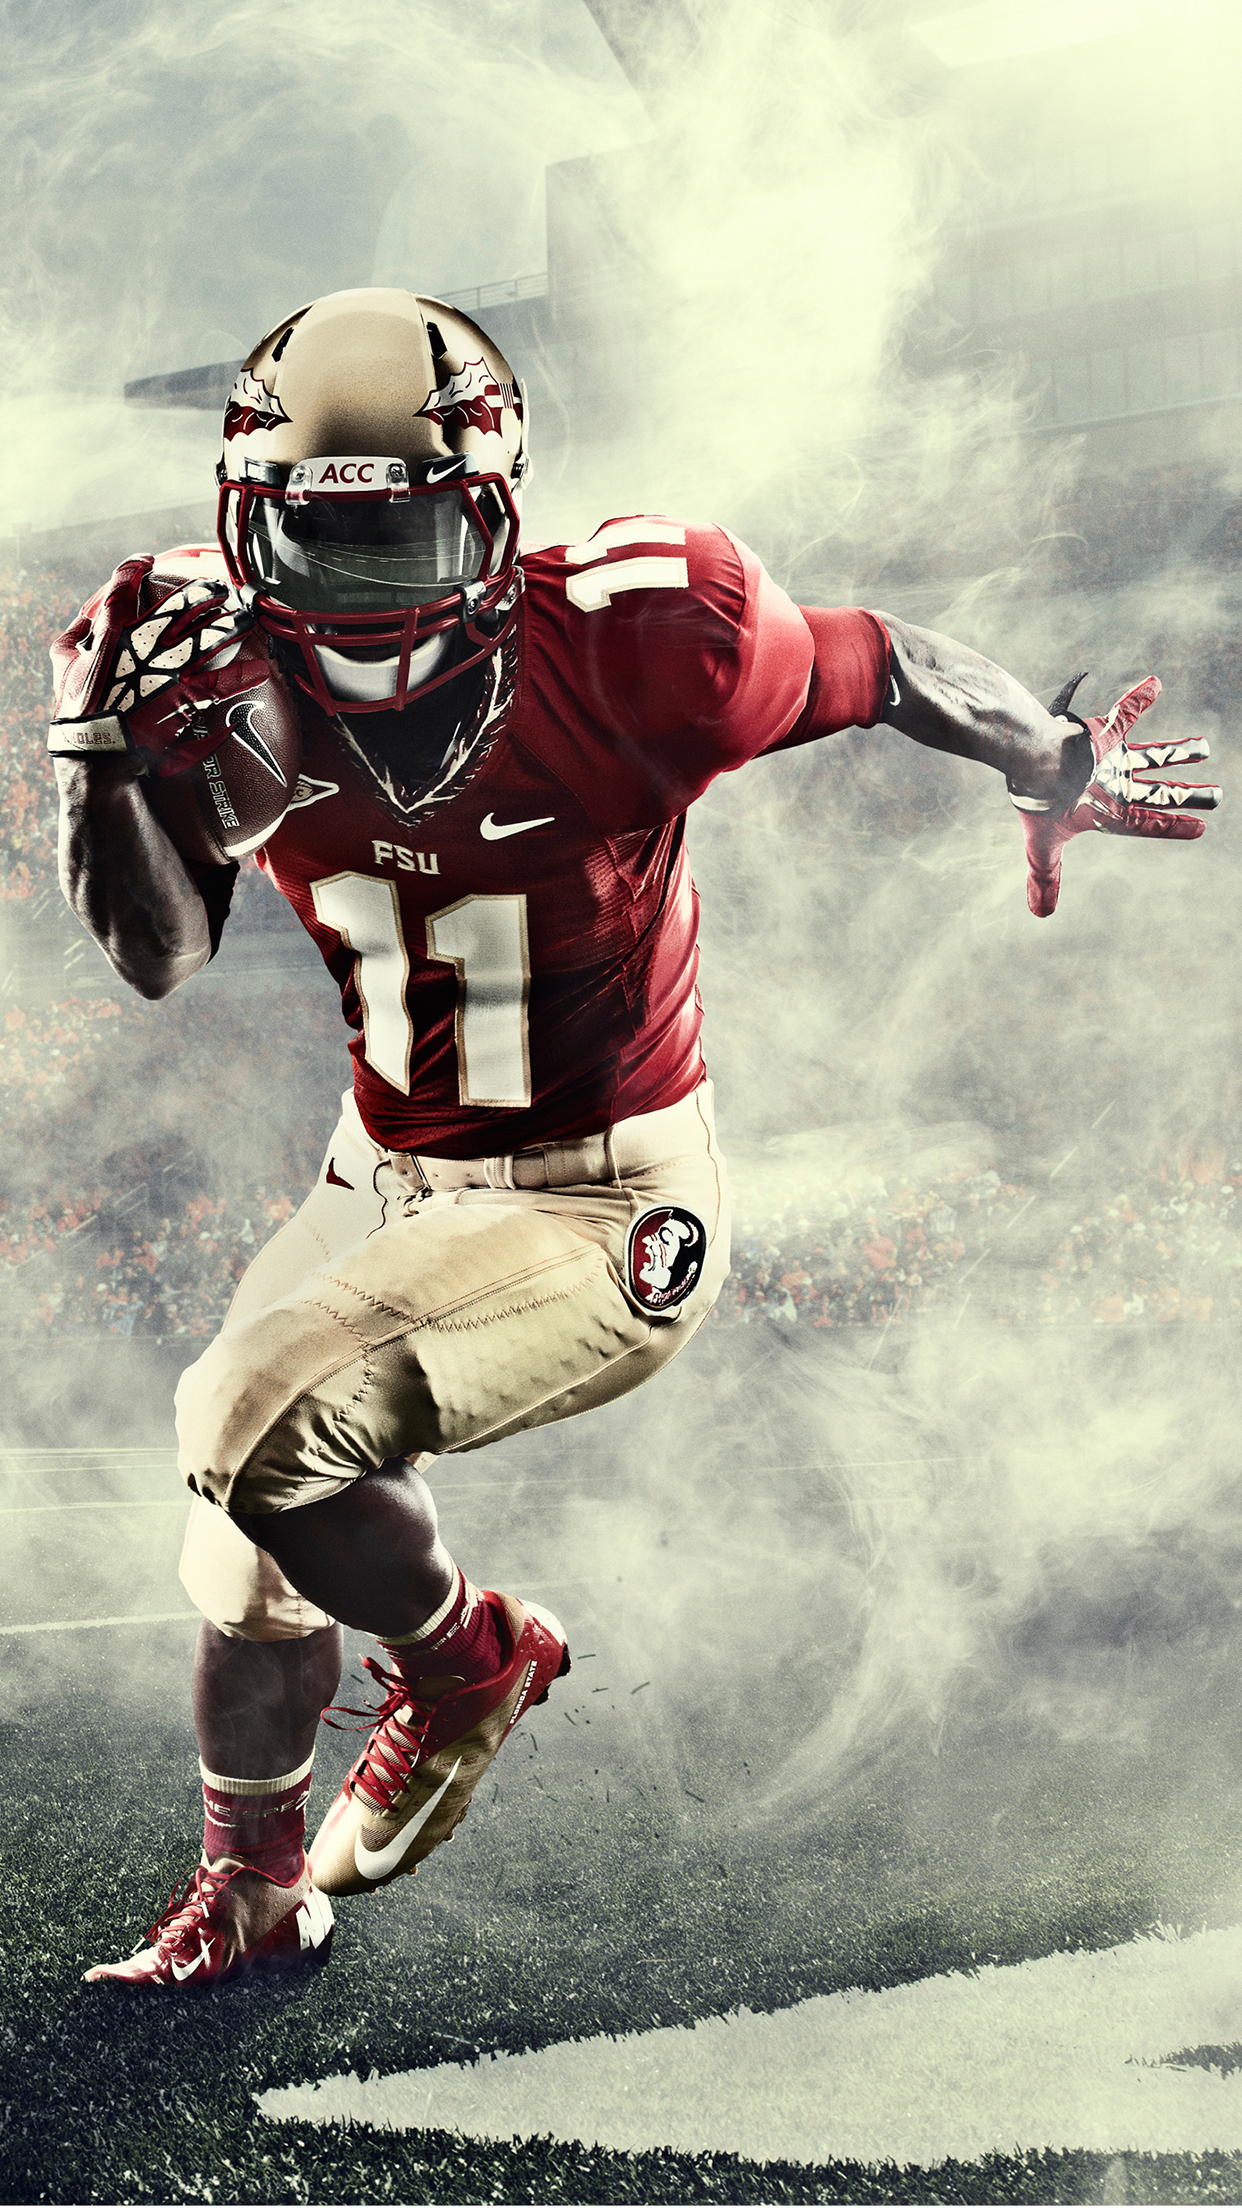 Nike american football wallpaper hd